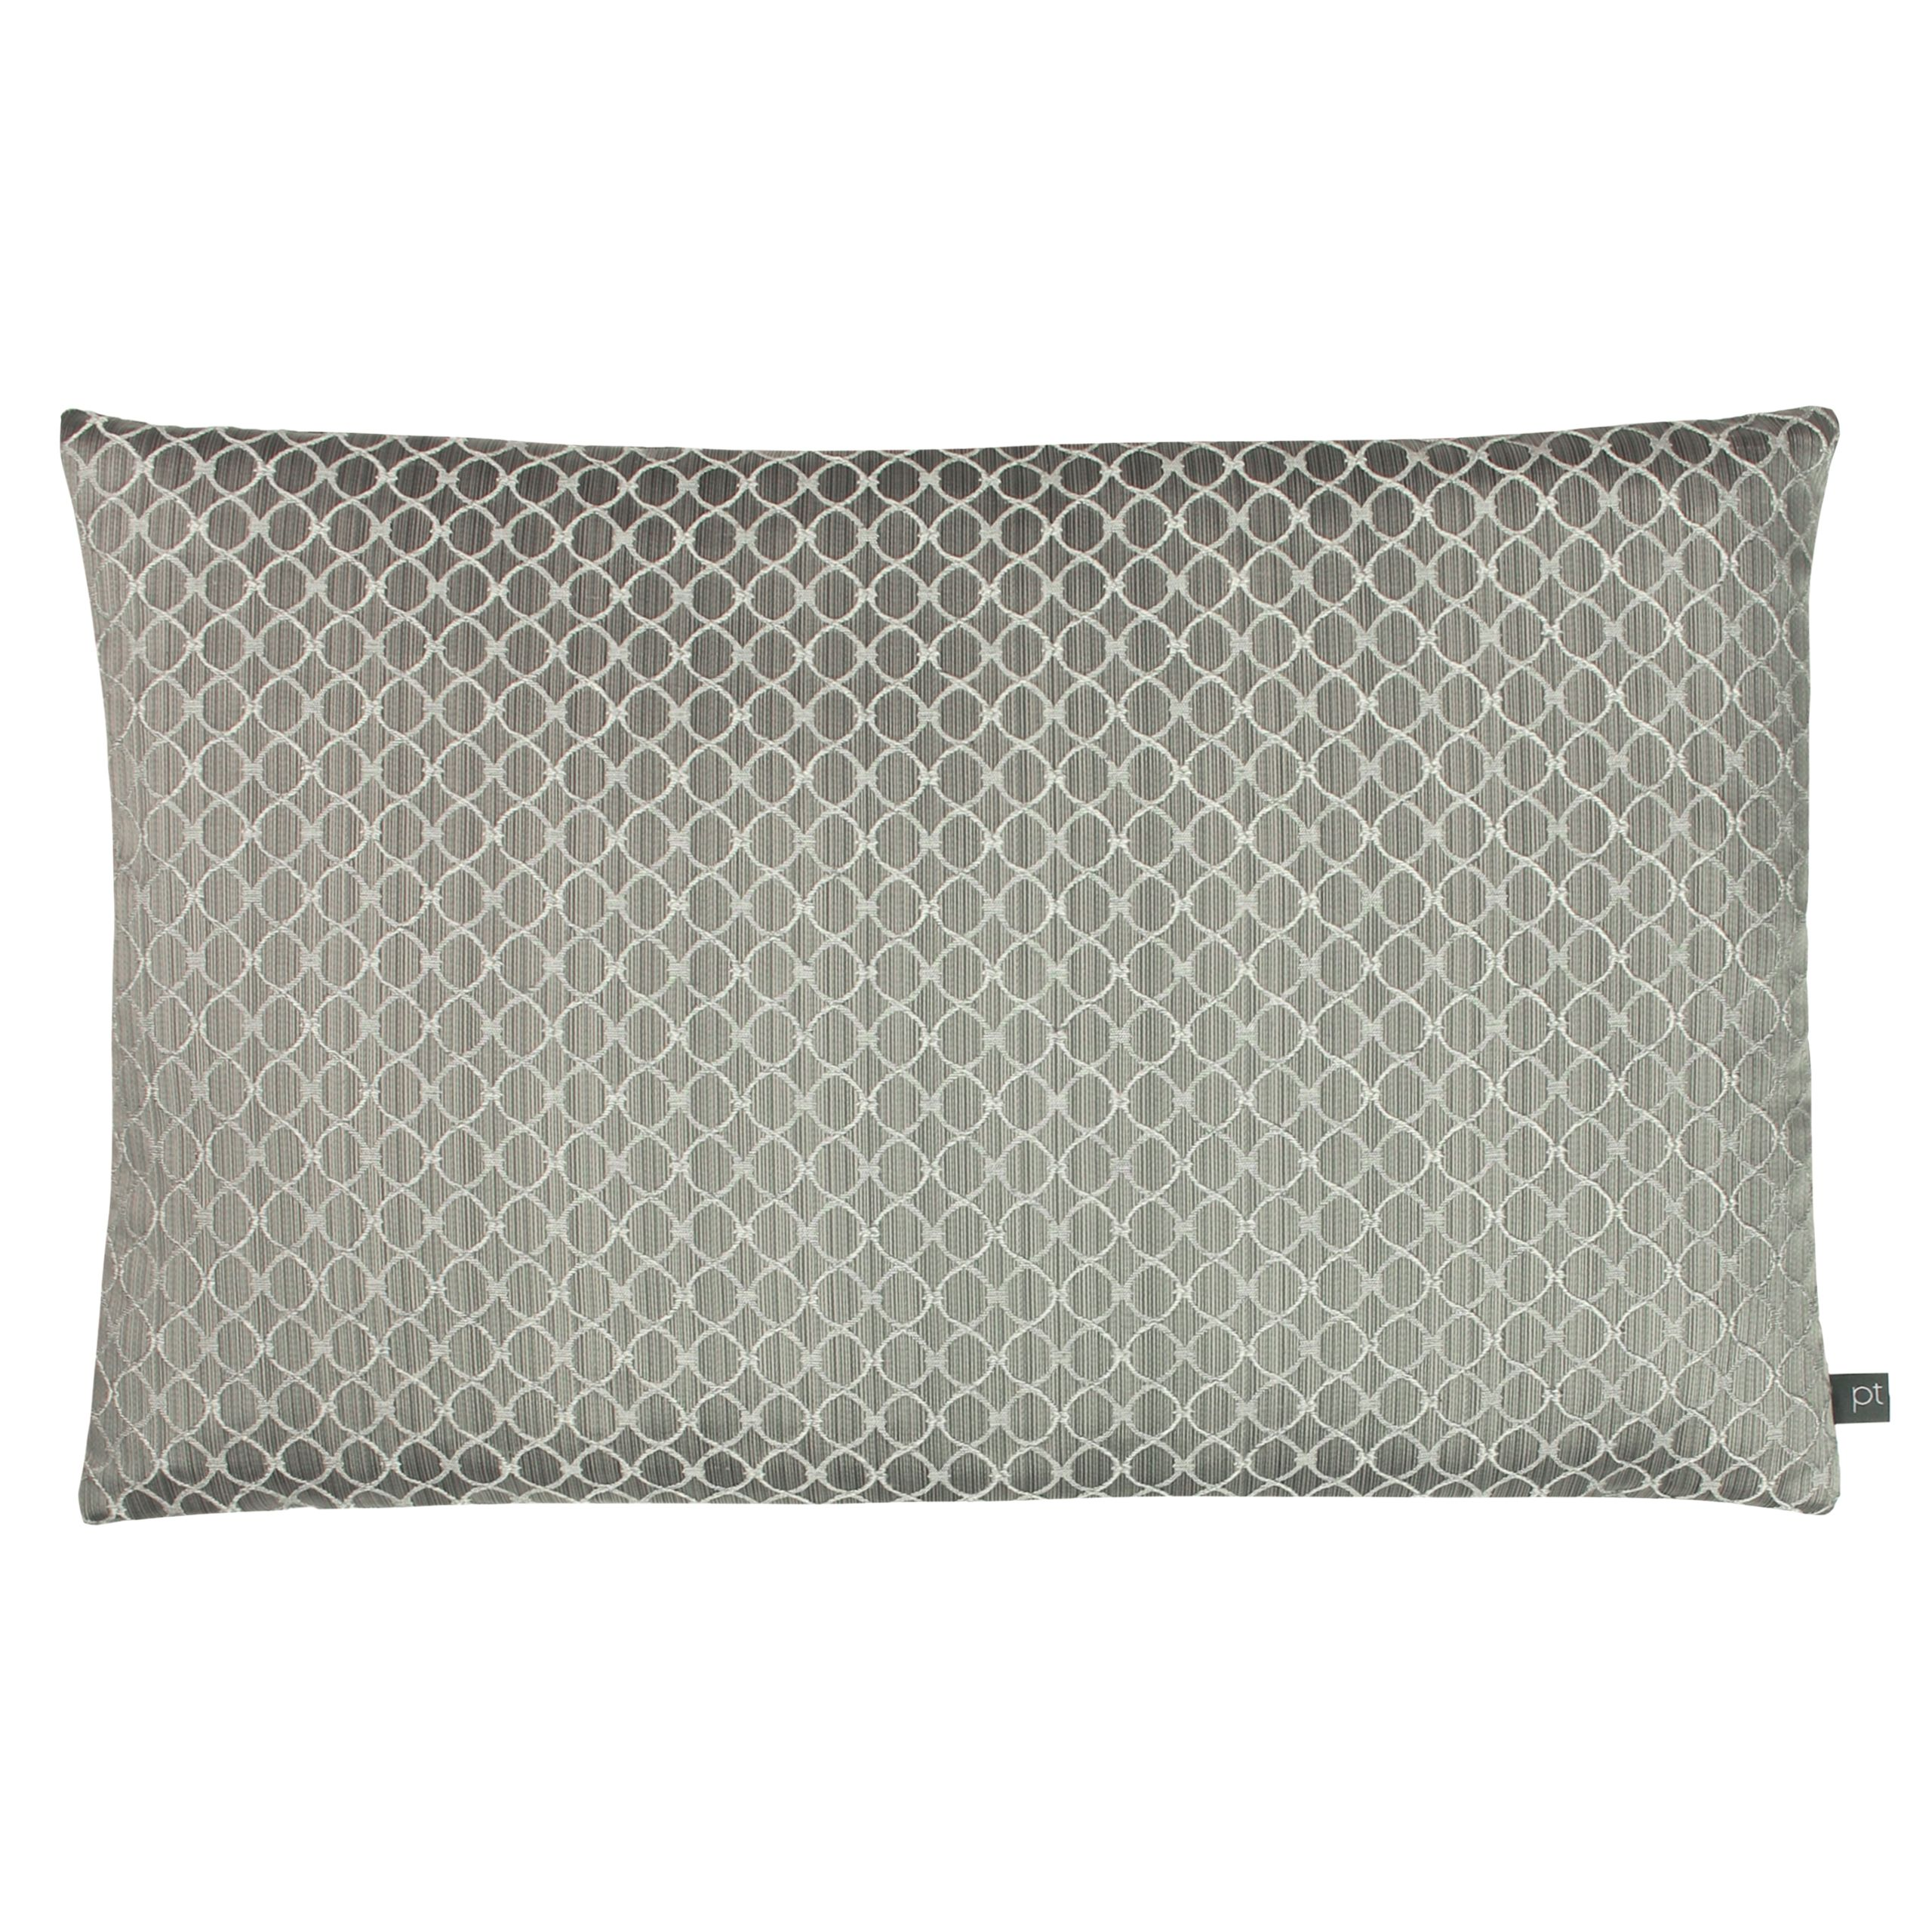 Prestigious Textiles Gemstone Polyester Filled Cushion, Polyester, Otter